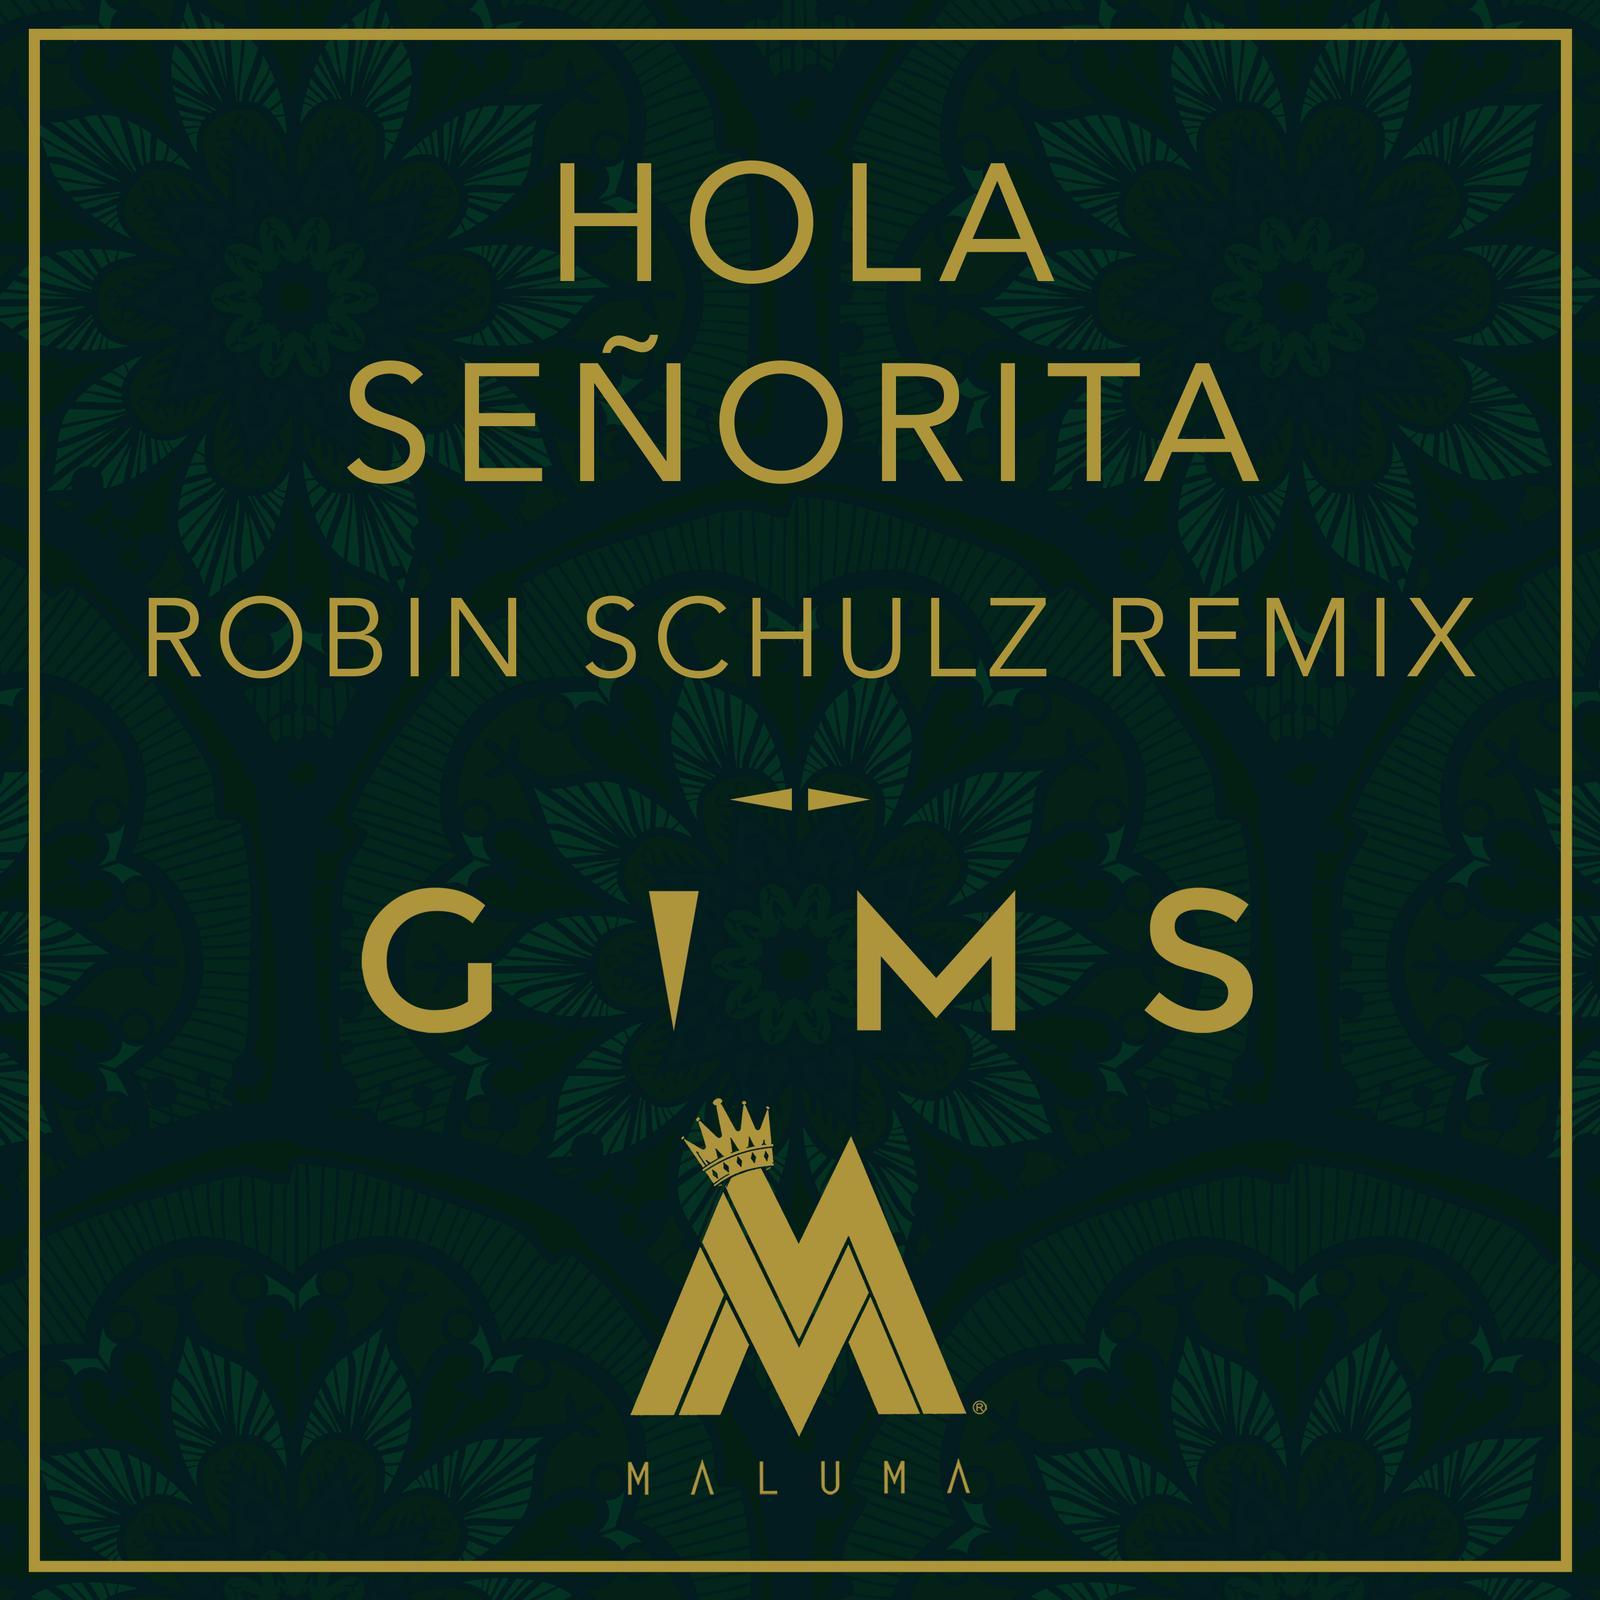 Hola señorita (Remix)